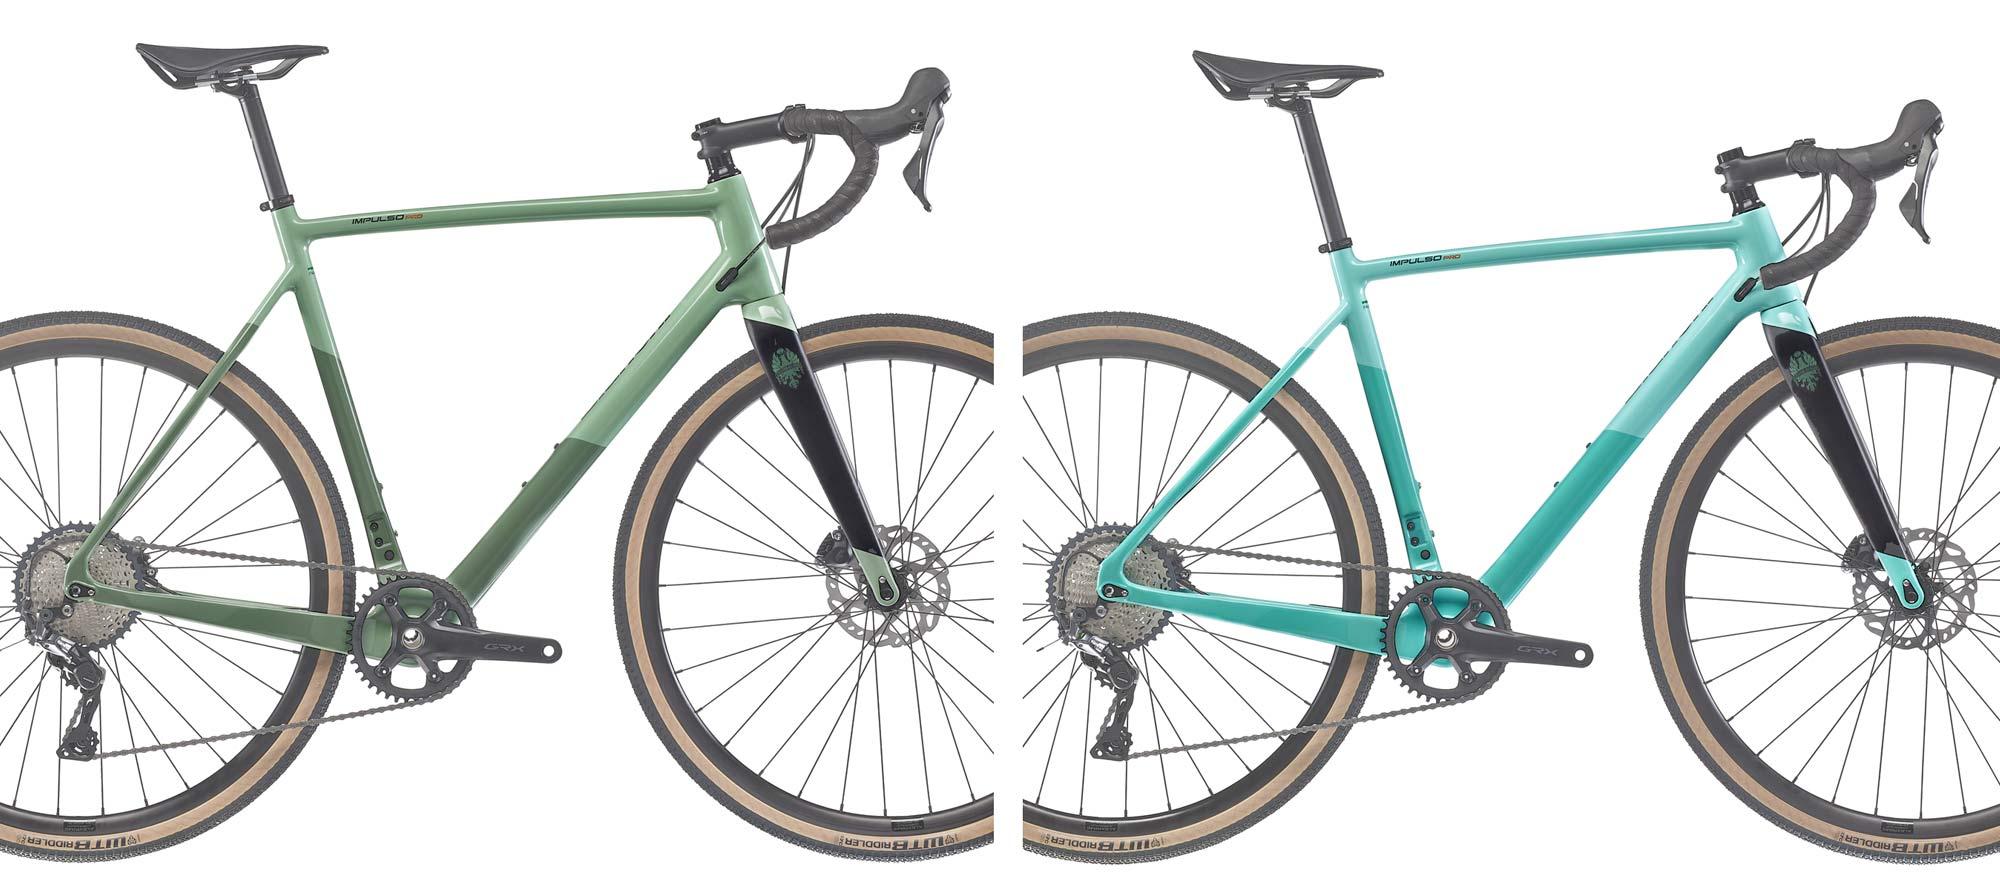 2022 Bianchi Impulso Pro carbon gravel bike, Zolder Pro CX cross cyclocross bike reborn,studio colors